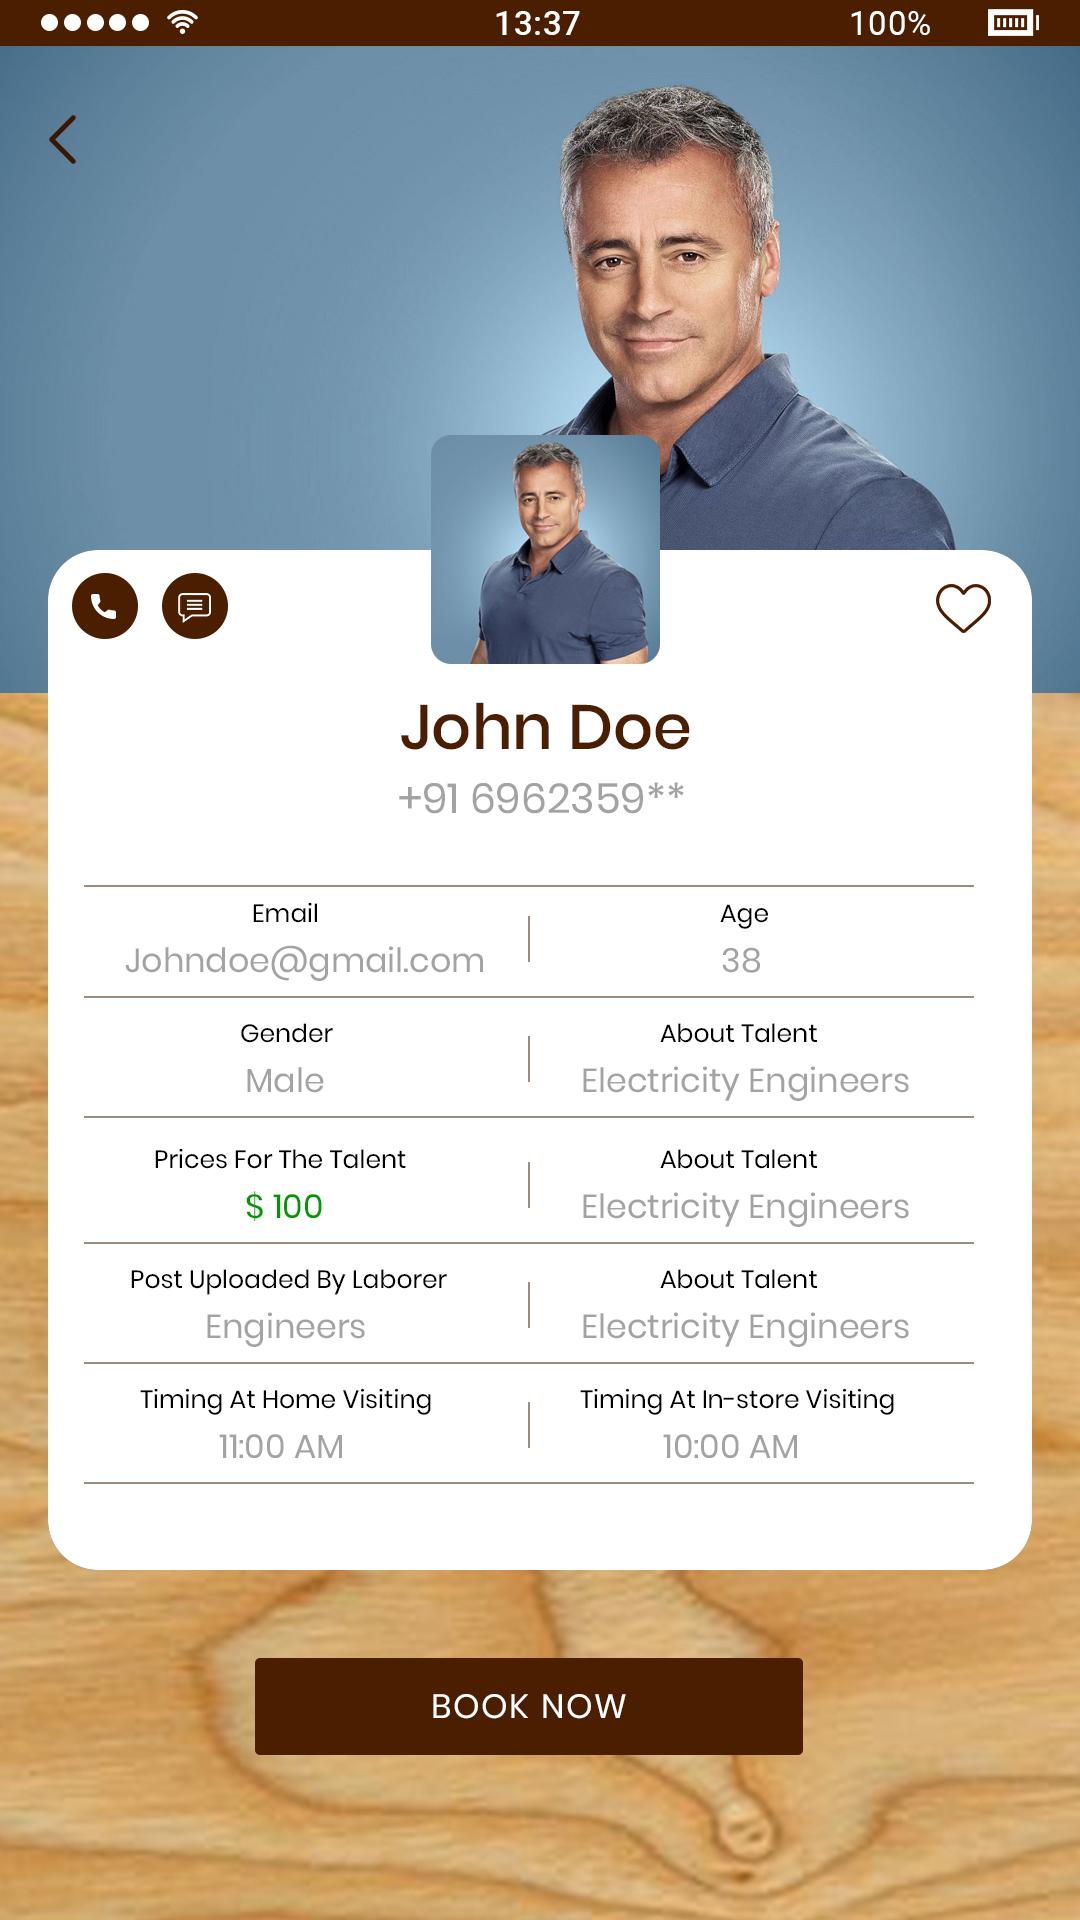 Mobile App Design – Service